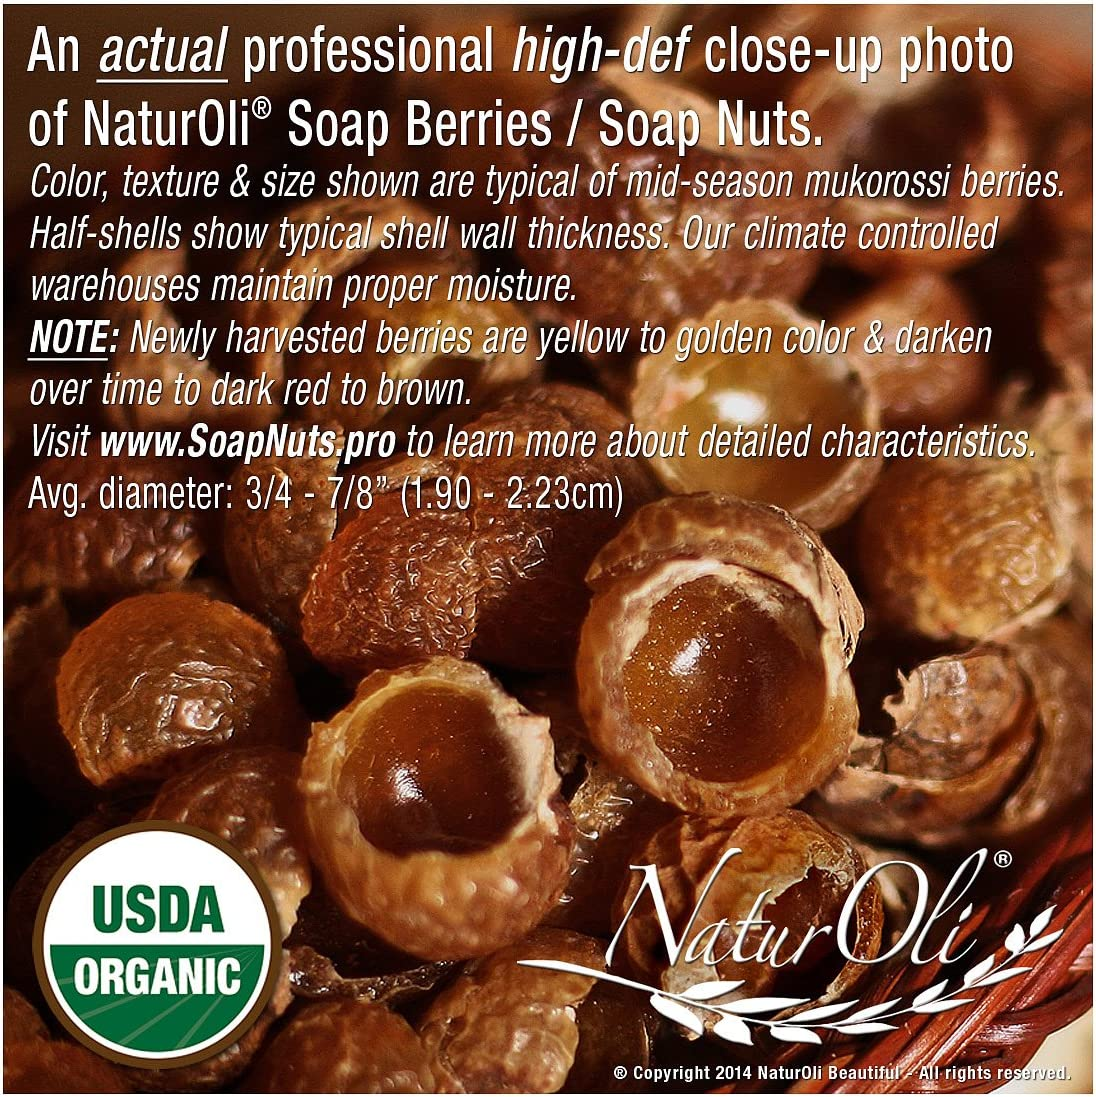 NaturOli Overstock Sale Organic Soap Nuts Soap Berries Pieces – Ten POUNDS 2000 Loads – Seedless USDA Certified – Fresh Wild Harvest – Hypoallergenic, Non-Toxic